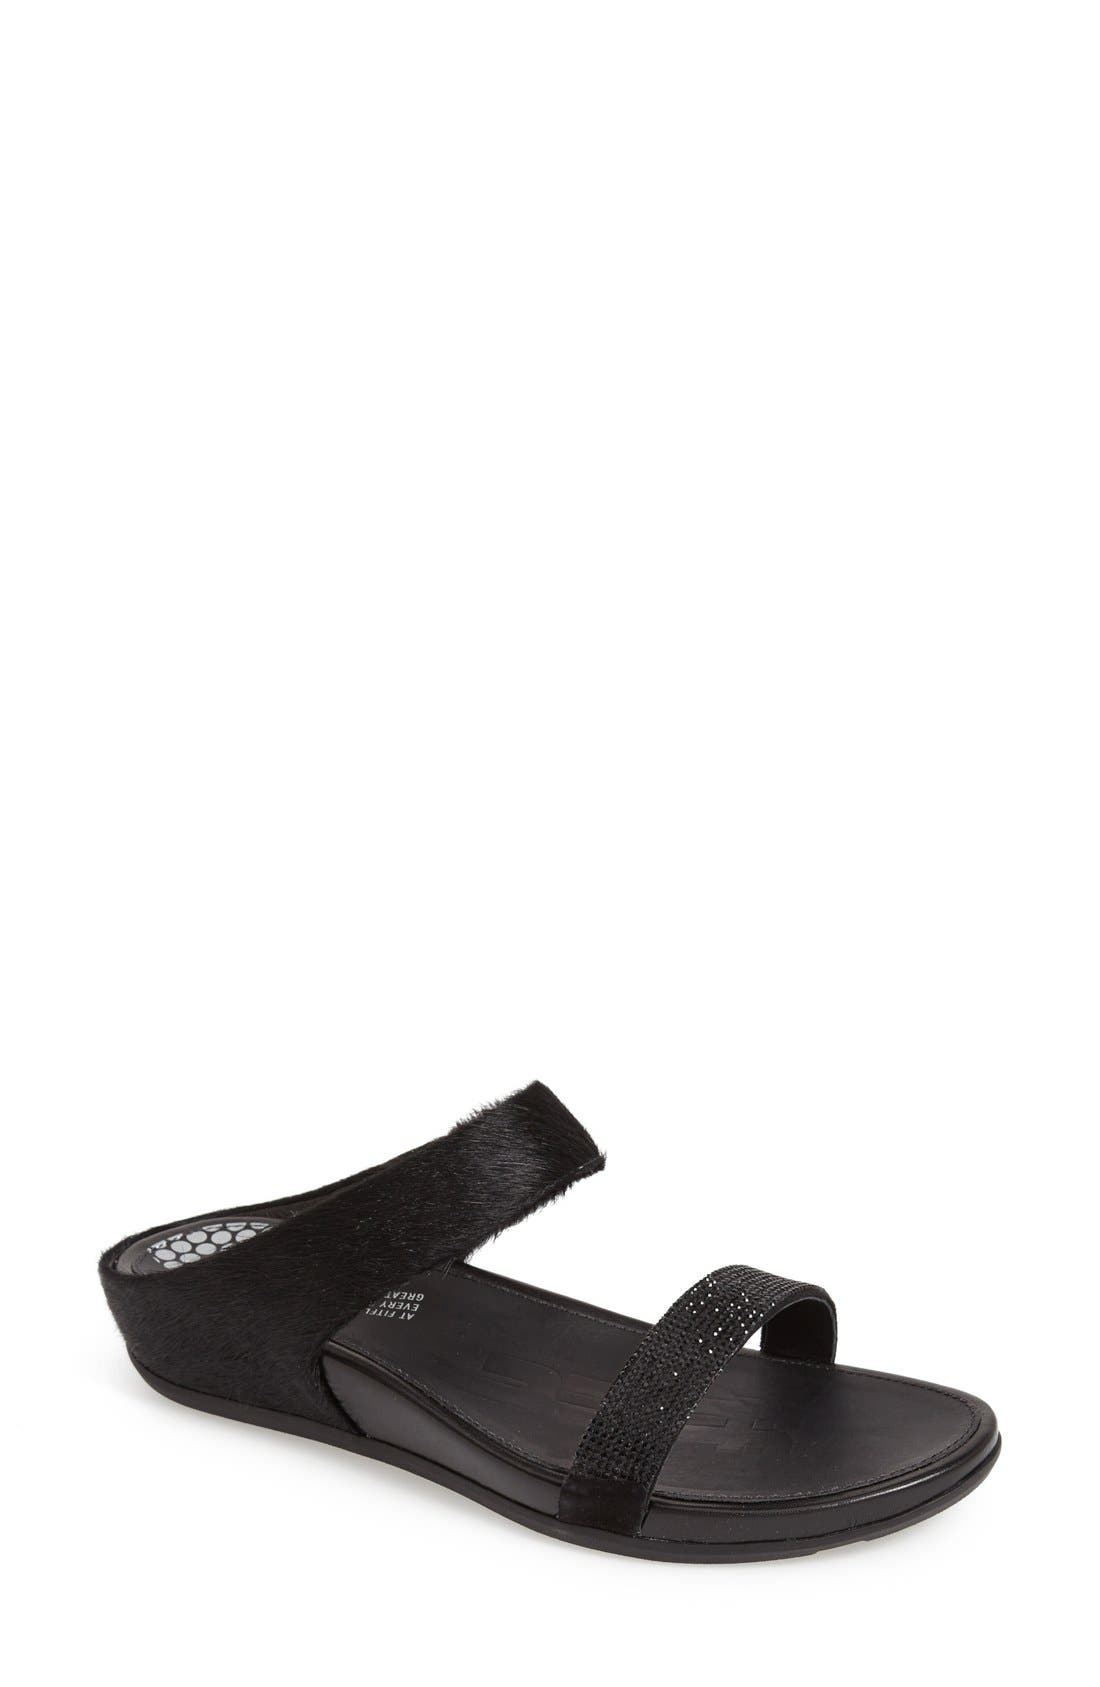 Main Image - FitFlop™ 'Banda' Slide Sandal (Women)